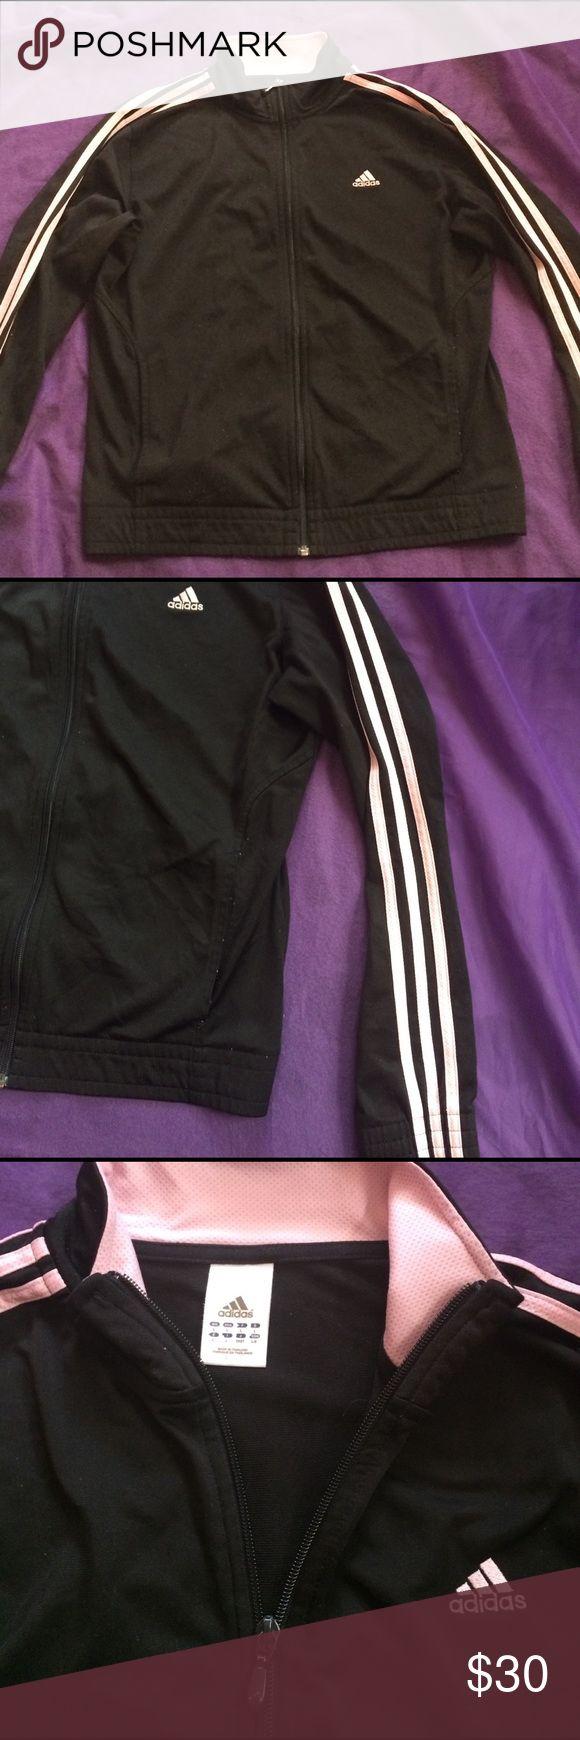 adidas jacket adidas womens jacket size l adidas jackets coats